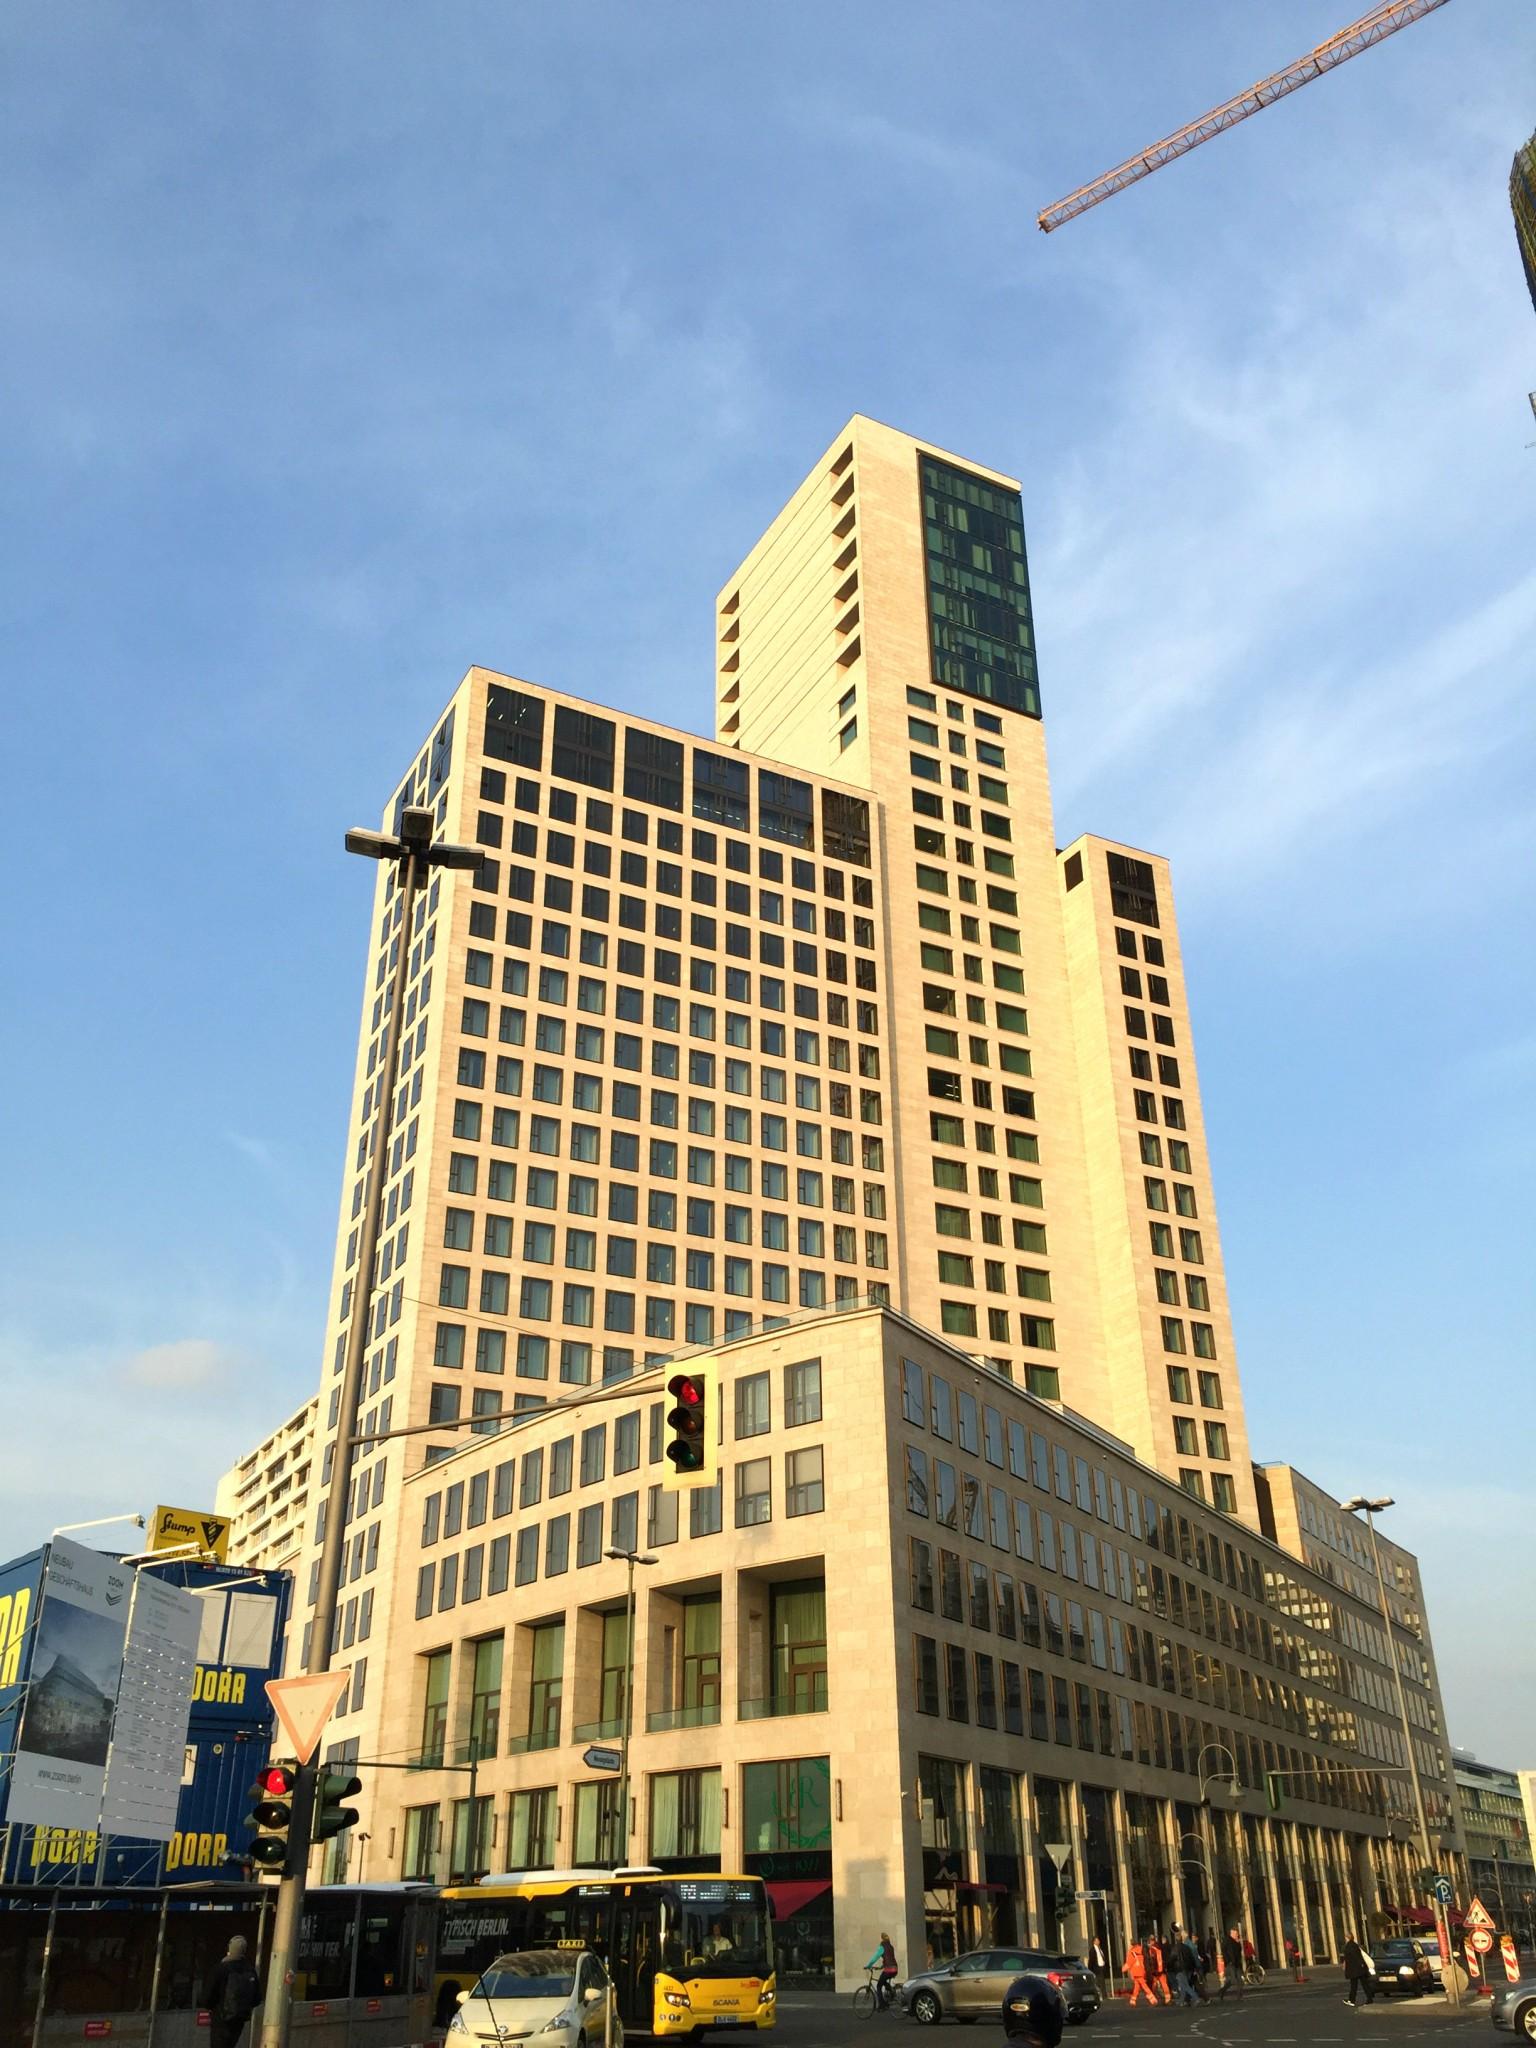 Waldorf Astoria Berlin ulkokuva